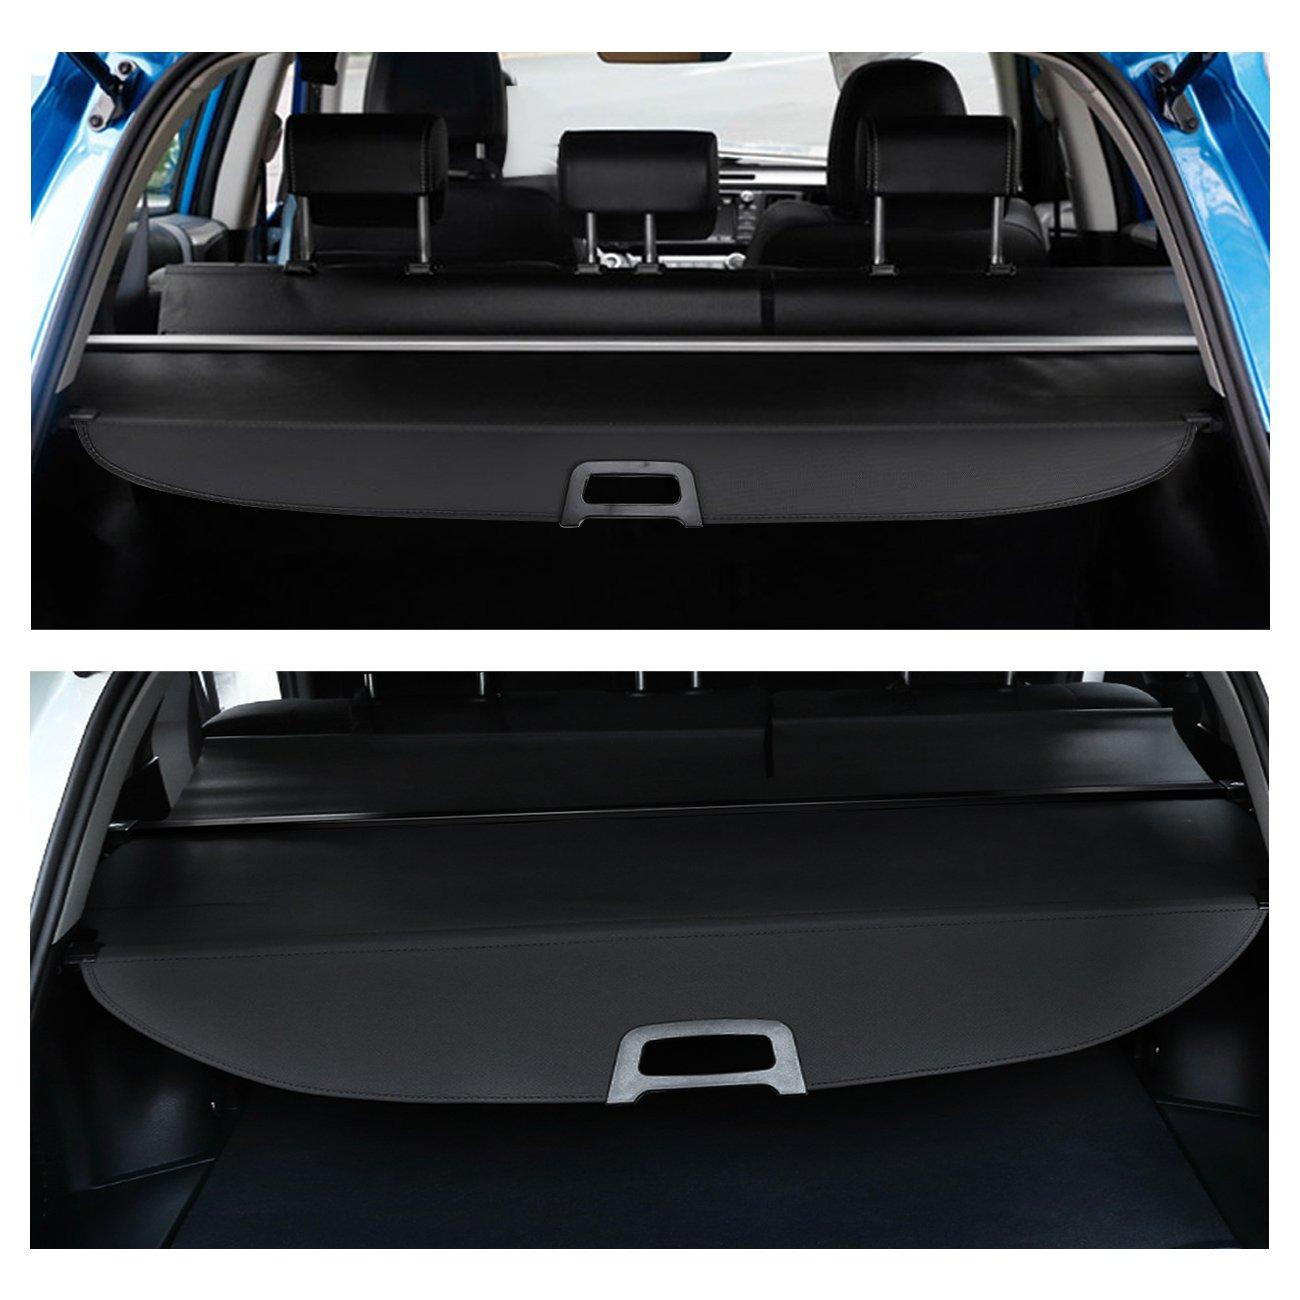 Amazon.com: AUXMART Cargo Cover Fits Ford Edge Trunk Retractable Shield  2011-2013: Automotive